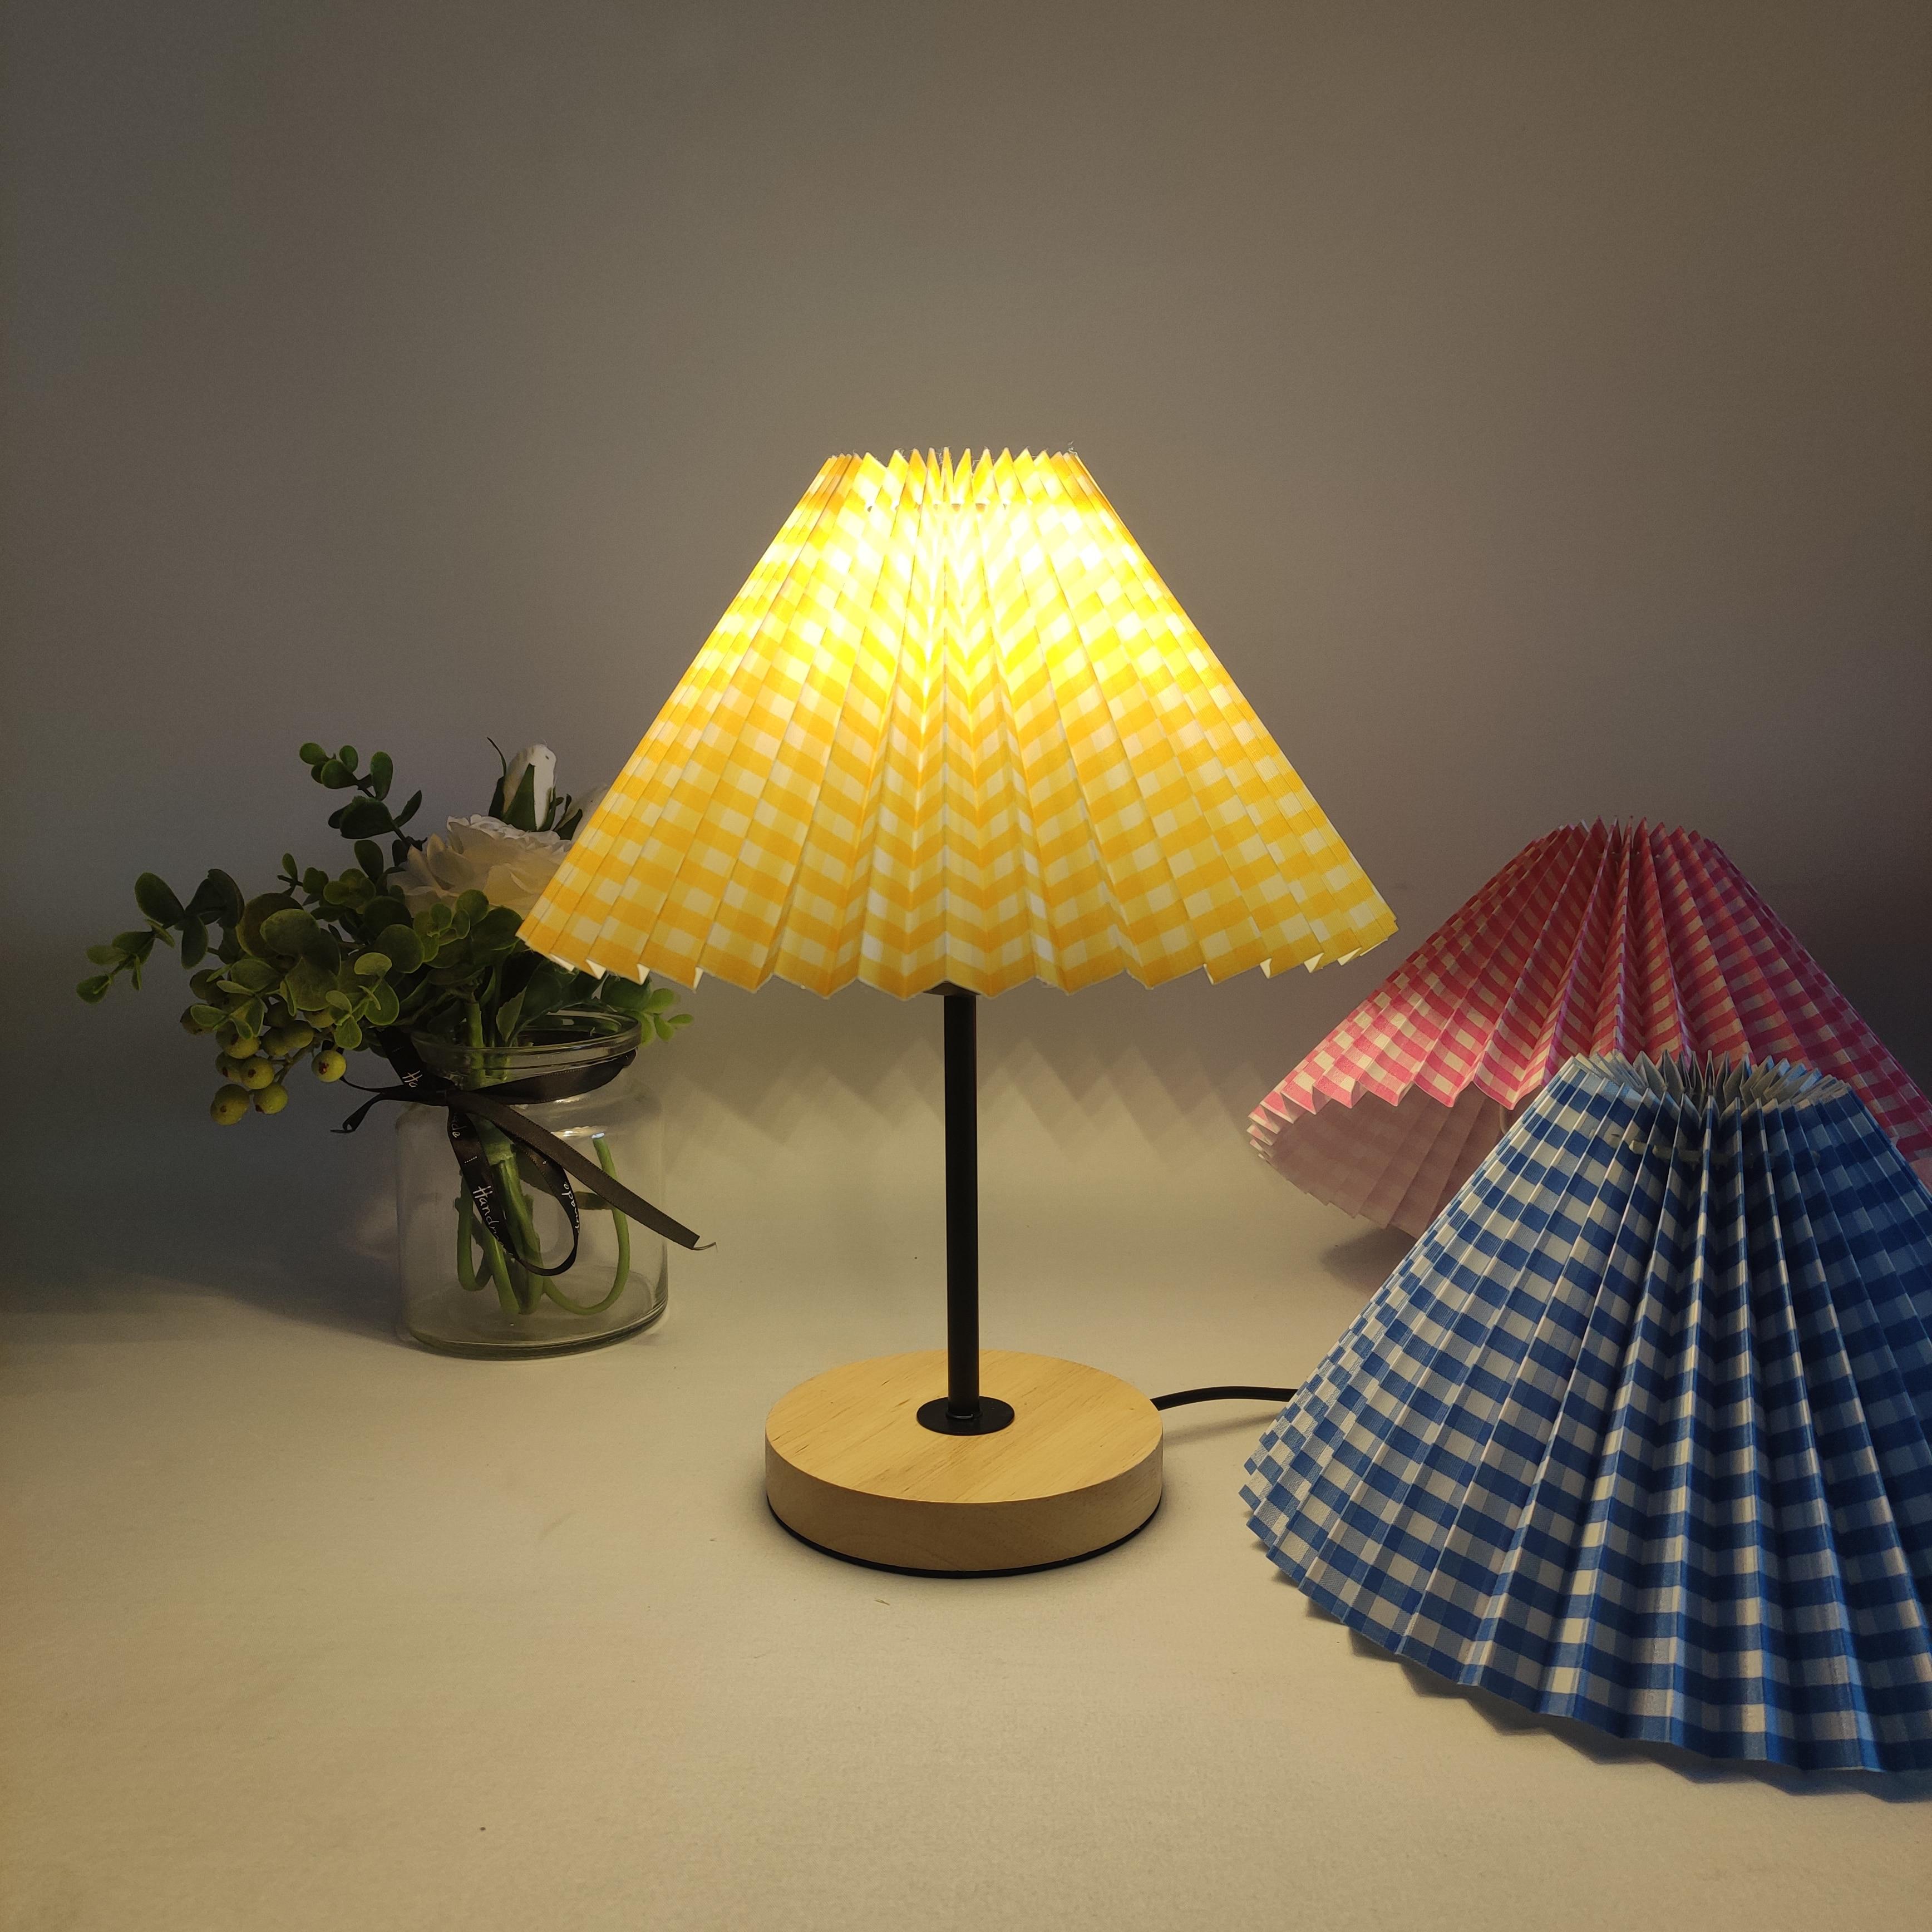 Xianfan Korean style black straight pole wooden base lattice cloth retro lampshade Table Lamp for bedroom tiffany night lights enlarge